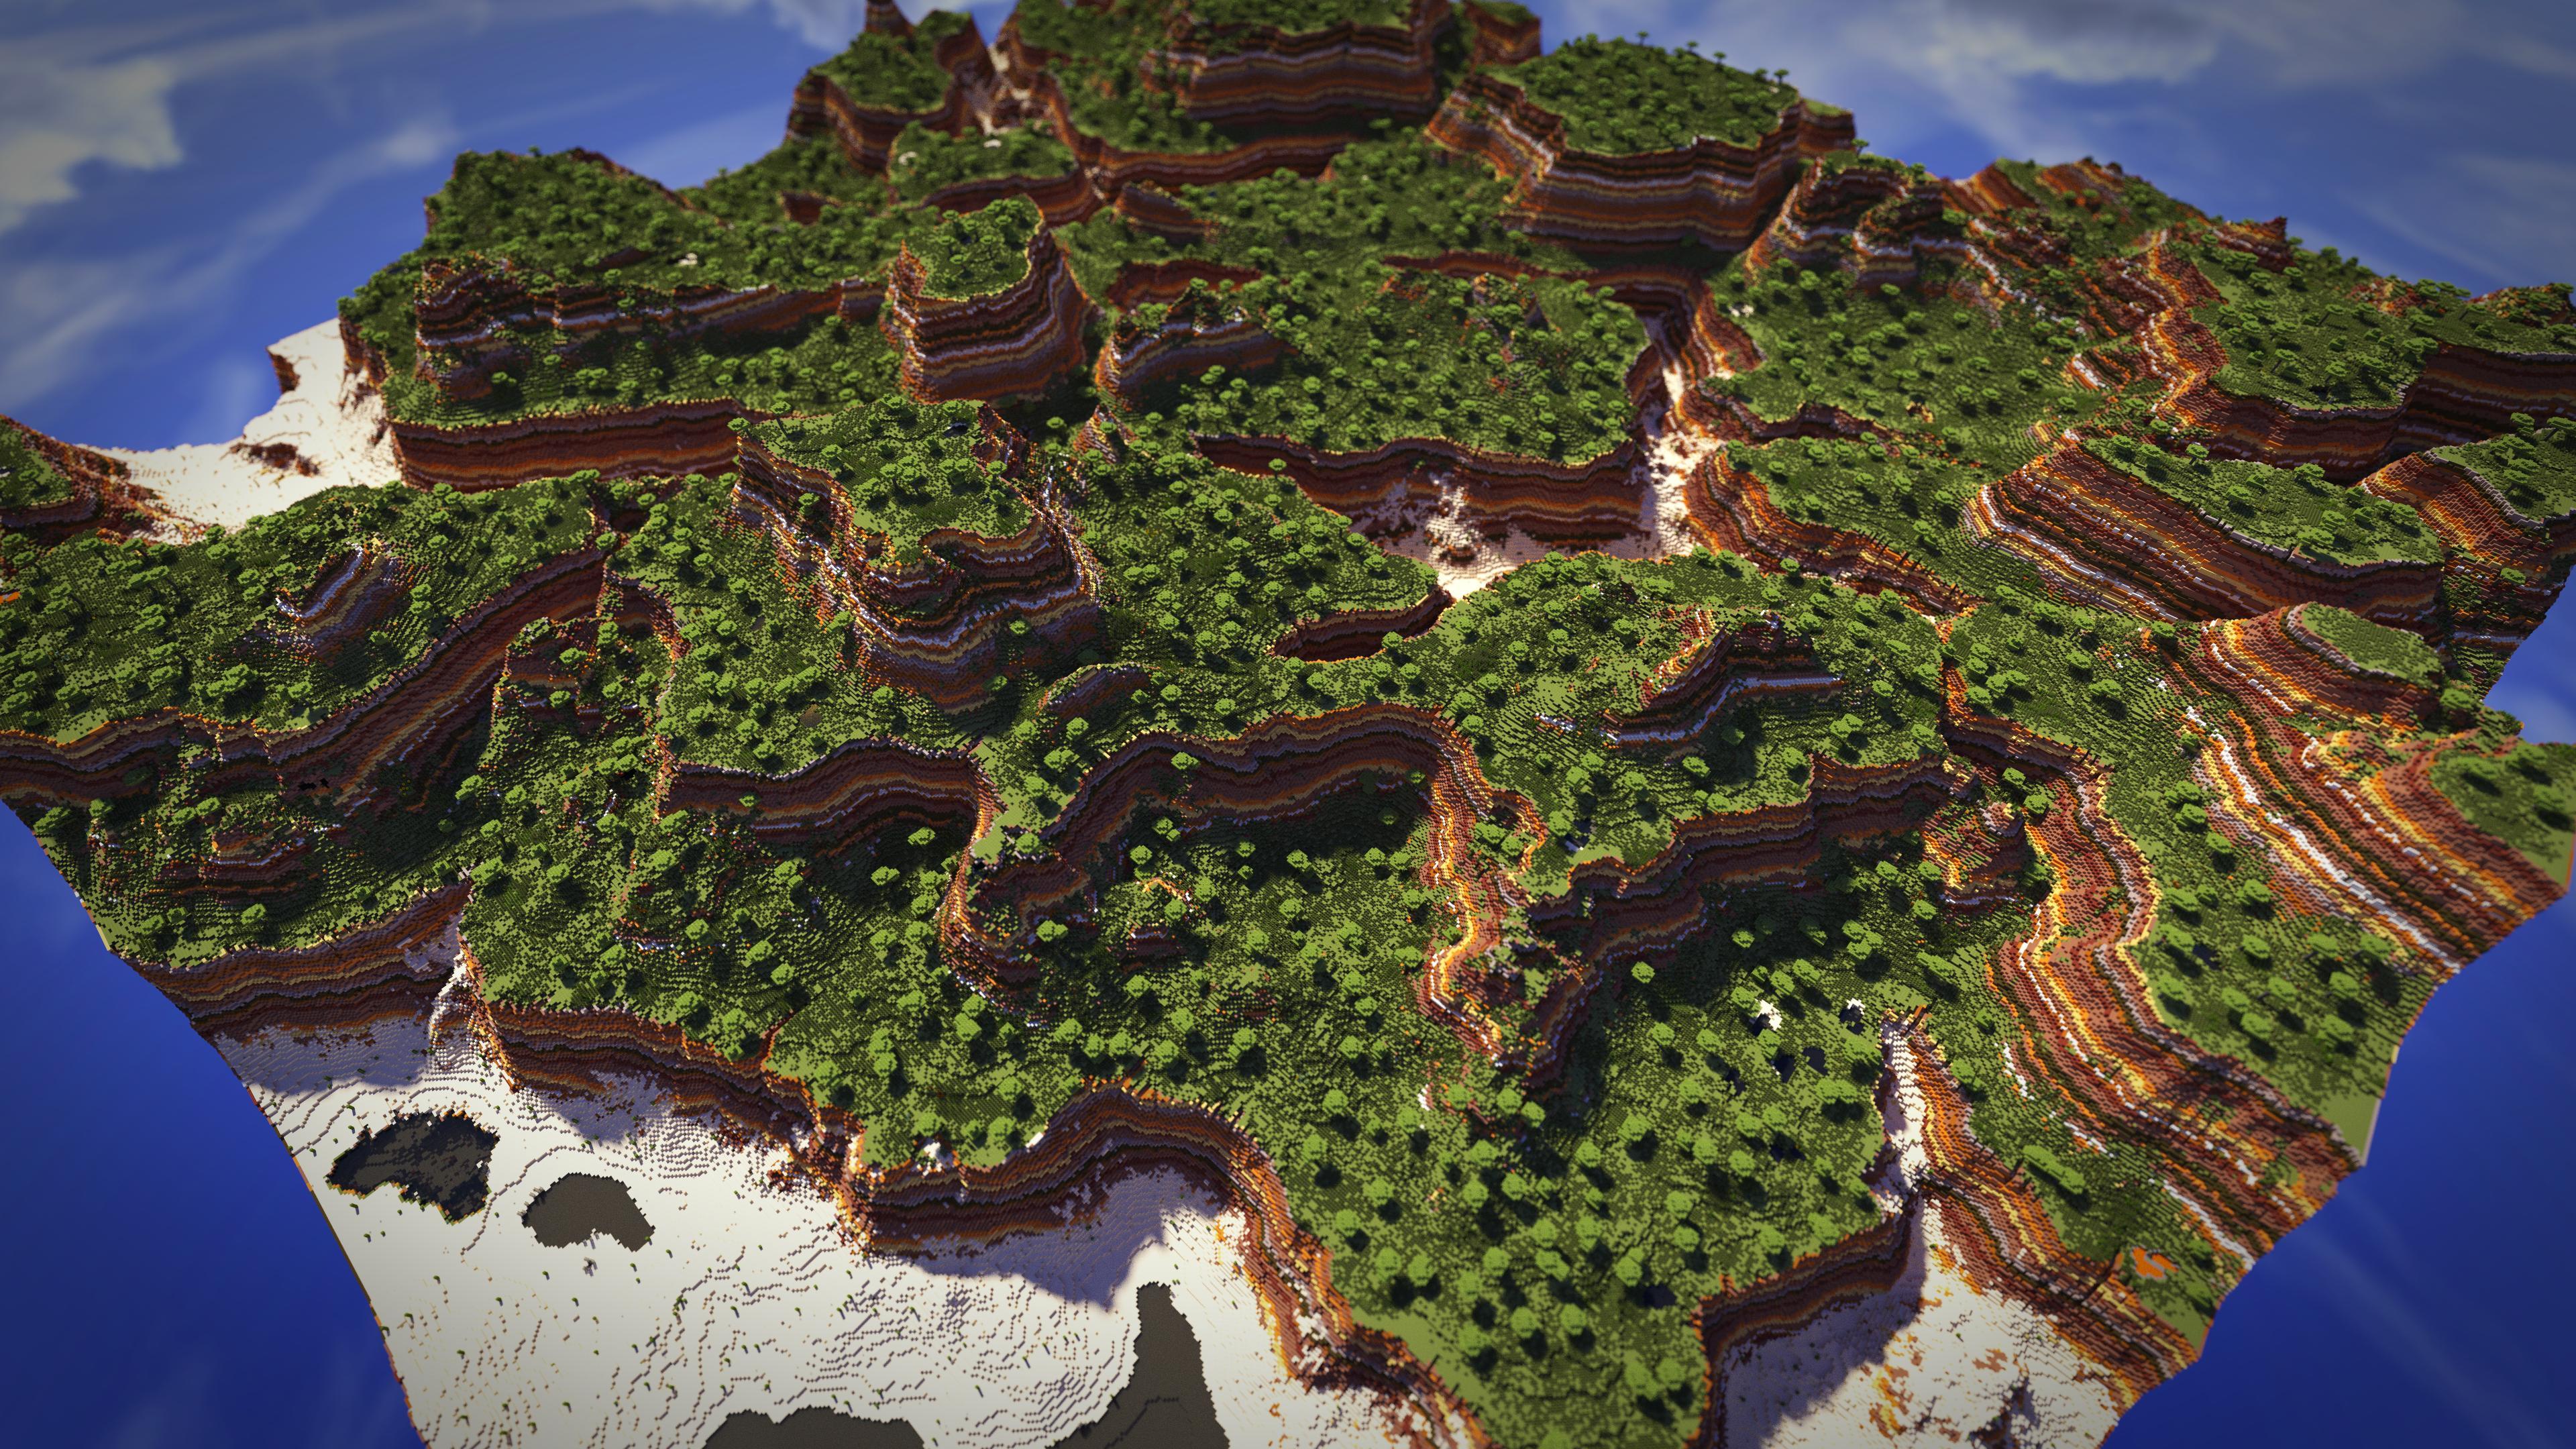 46 4k Minecraft Wallpaper On Wallpapersafari